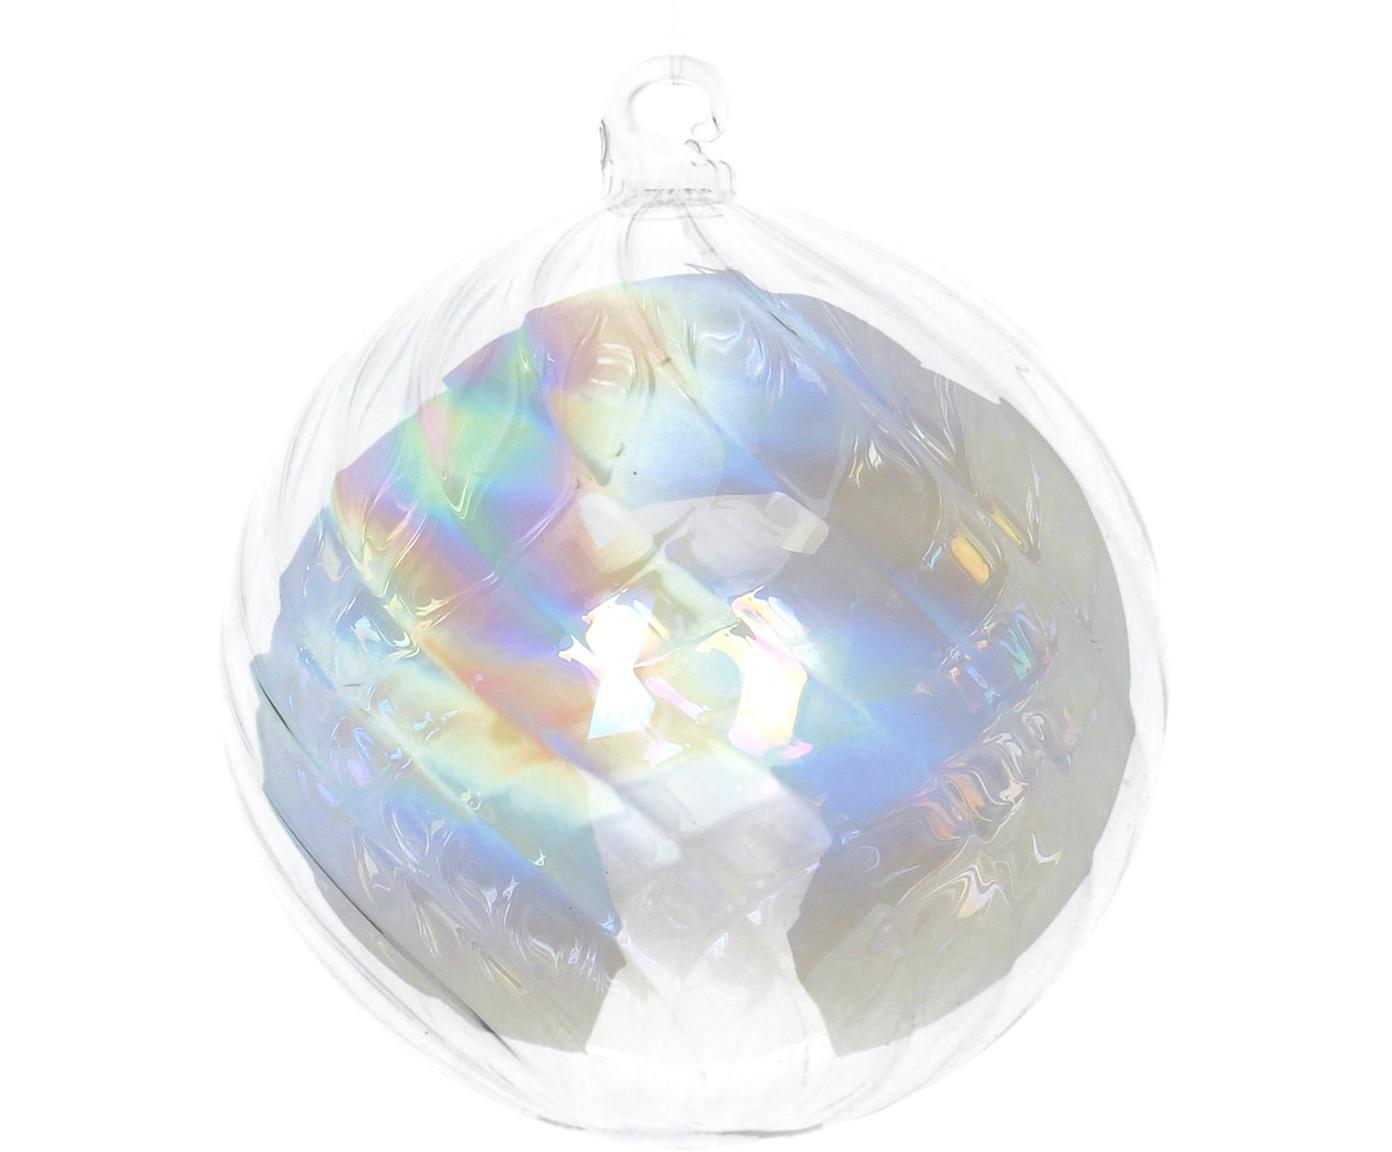 Weihnachtskugeln Iridescent Ø8cm, 2Stück, Transparent, irisierend, Ø 8 cm